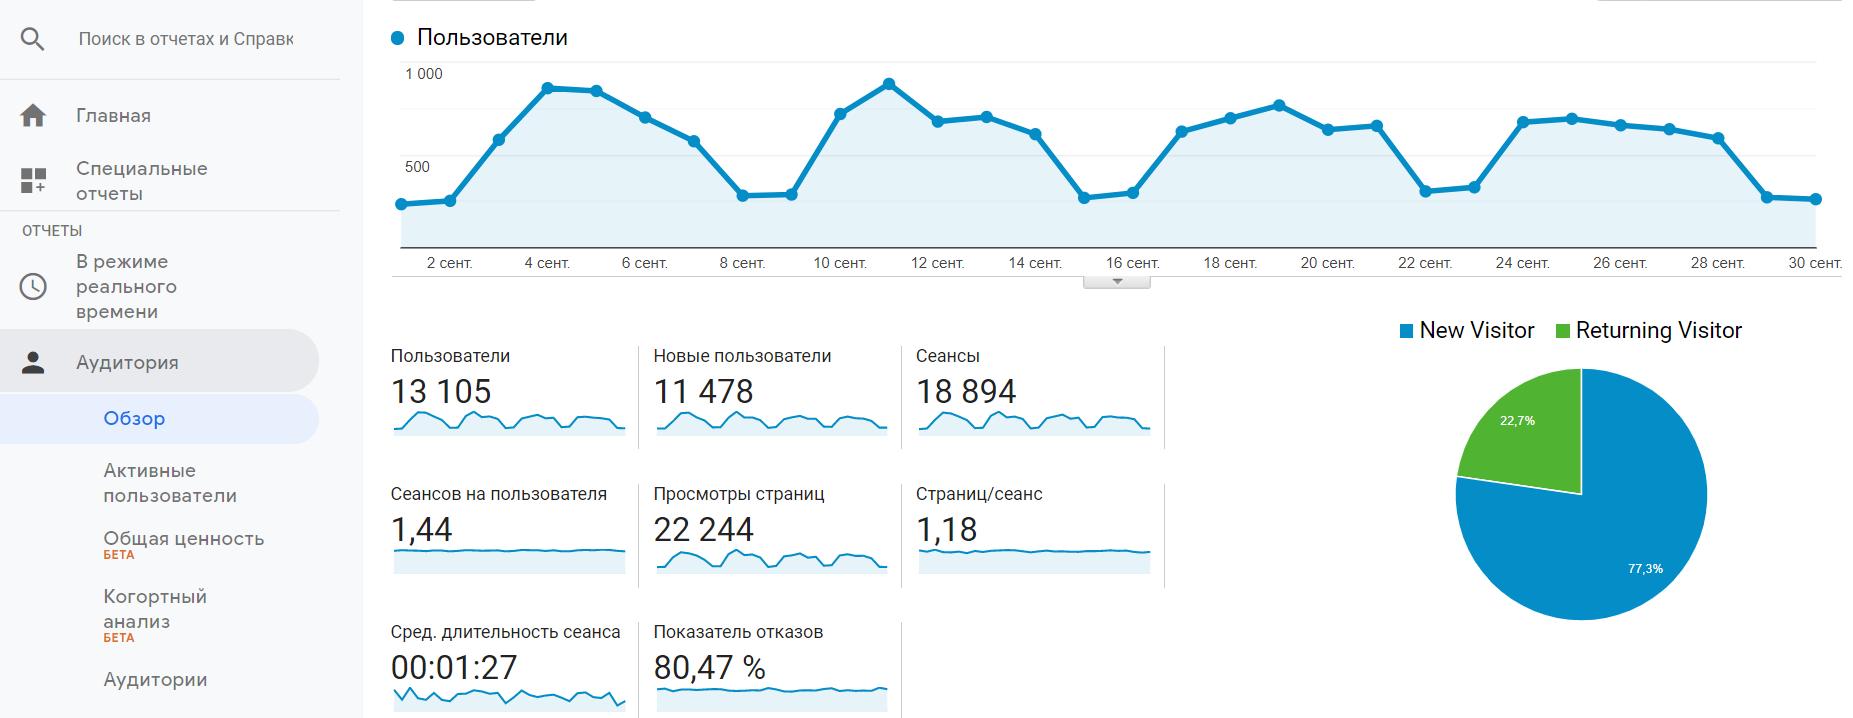 Пример отчета Google Analytics о посещаемости сайта